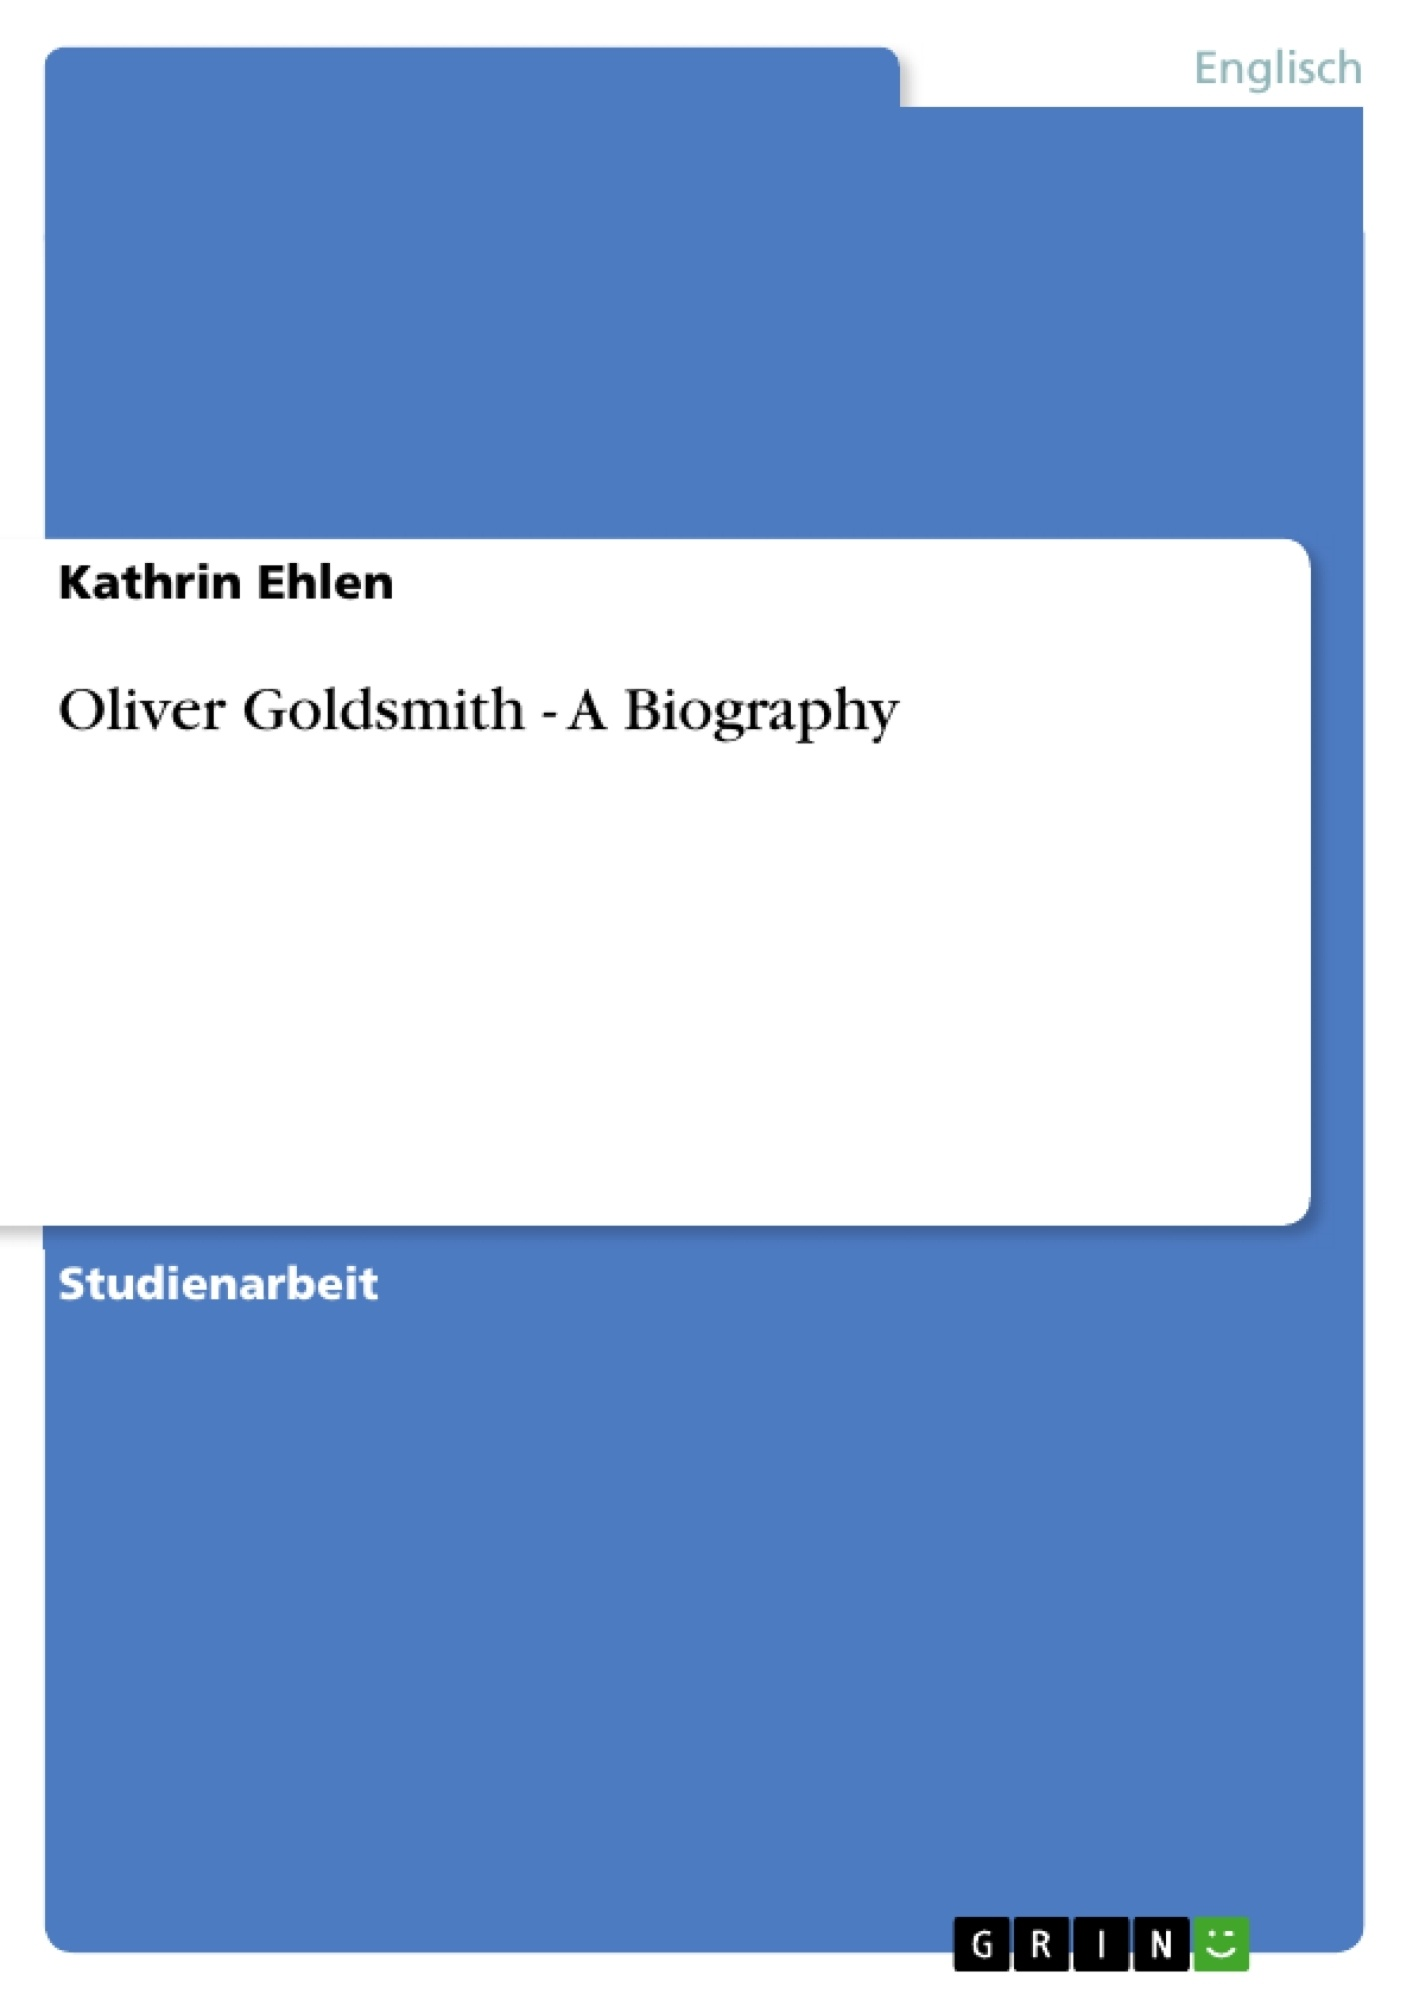 Titel: Oliver Goldsmith - A Biography